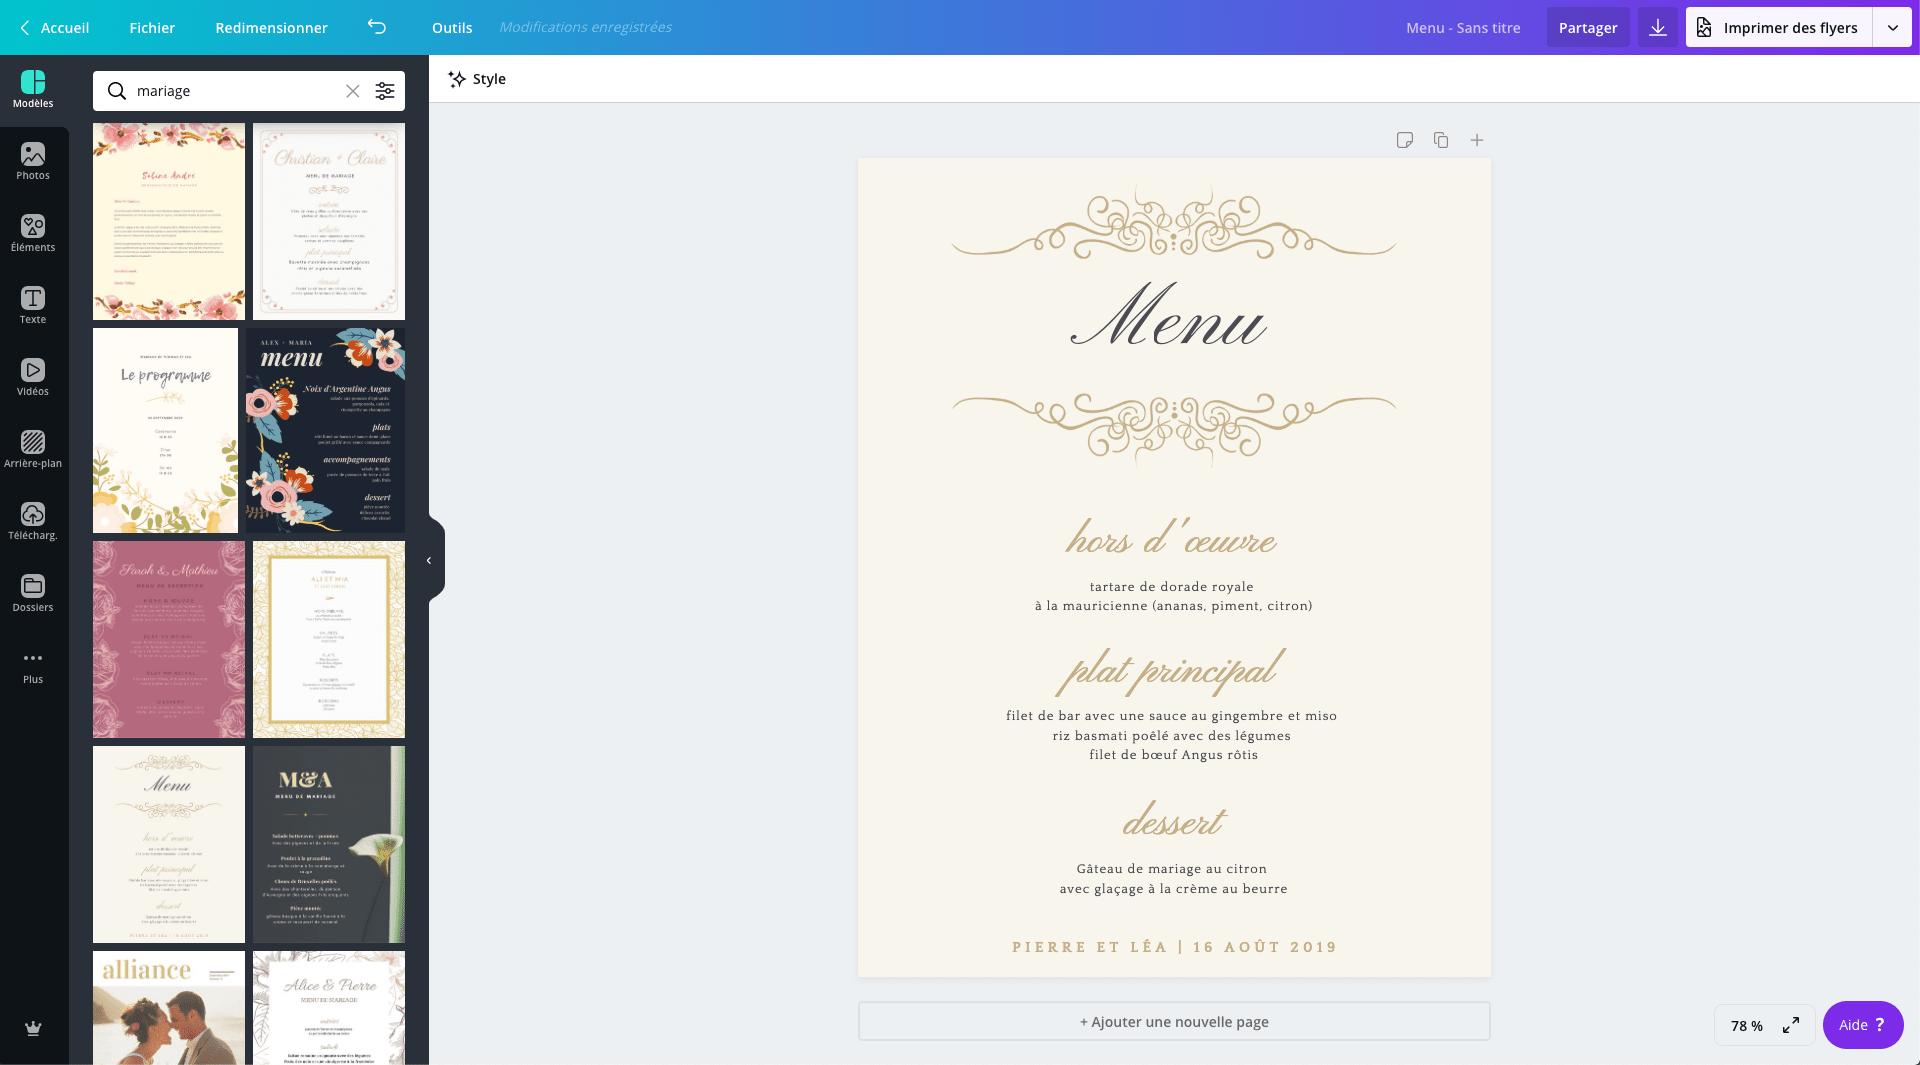 Carte De Menu De Mariage Gratuit A Imprimer Canva